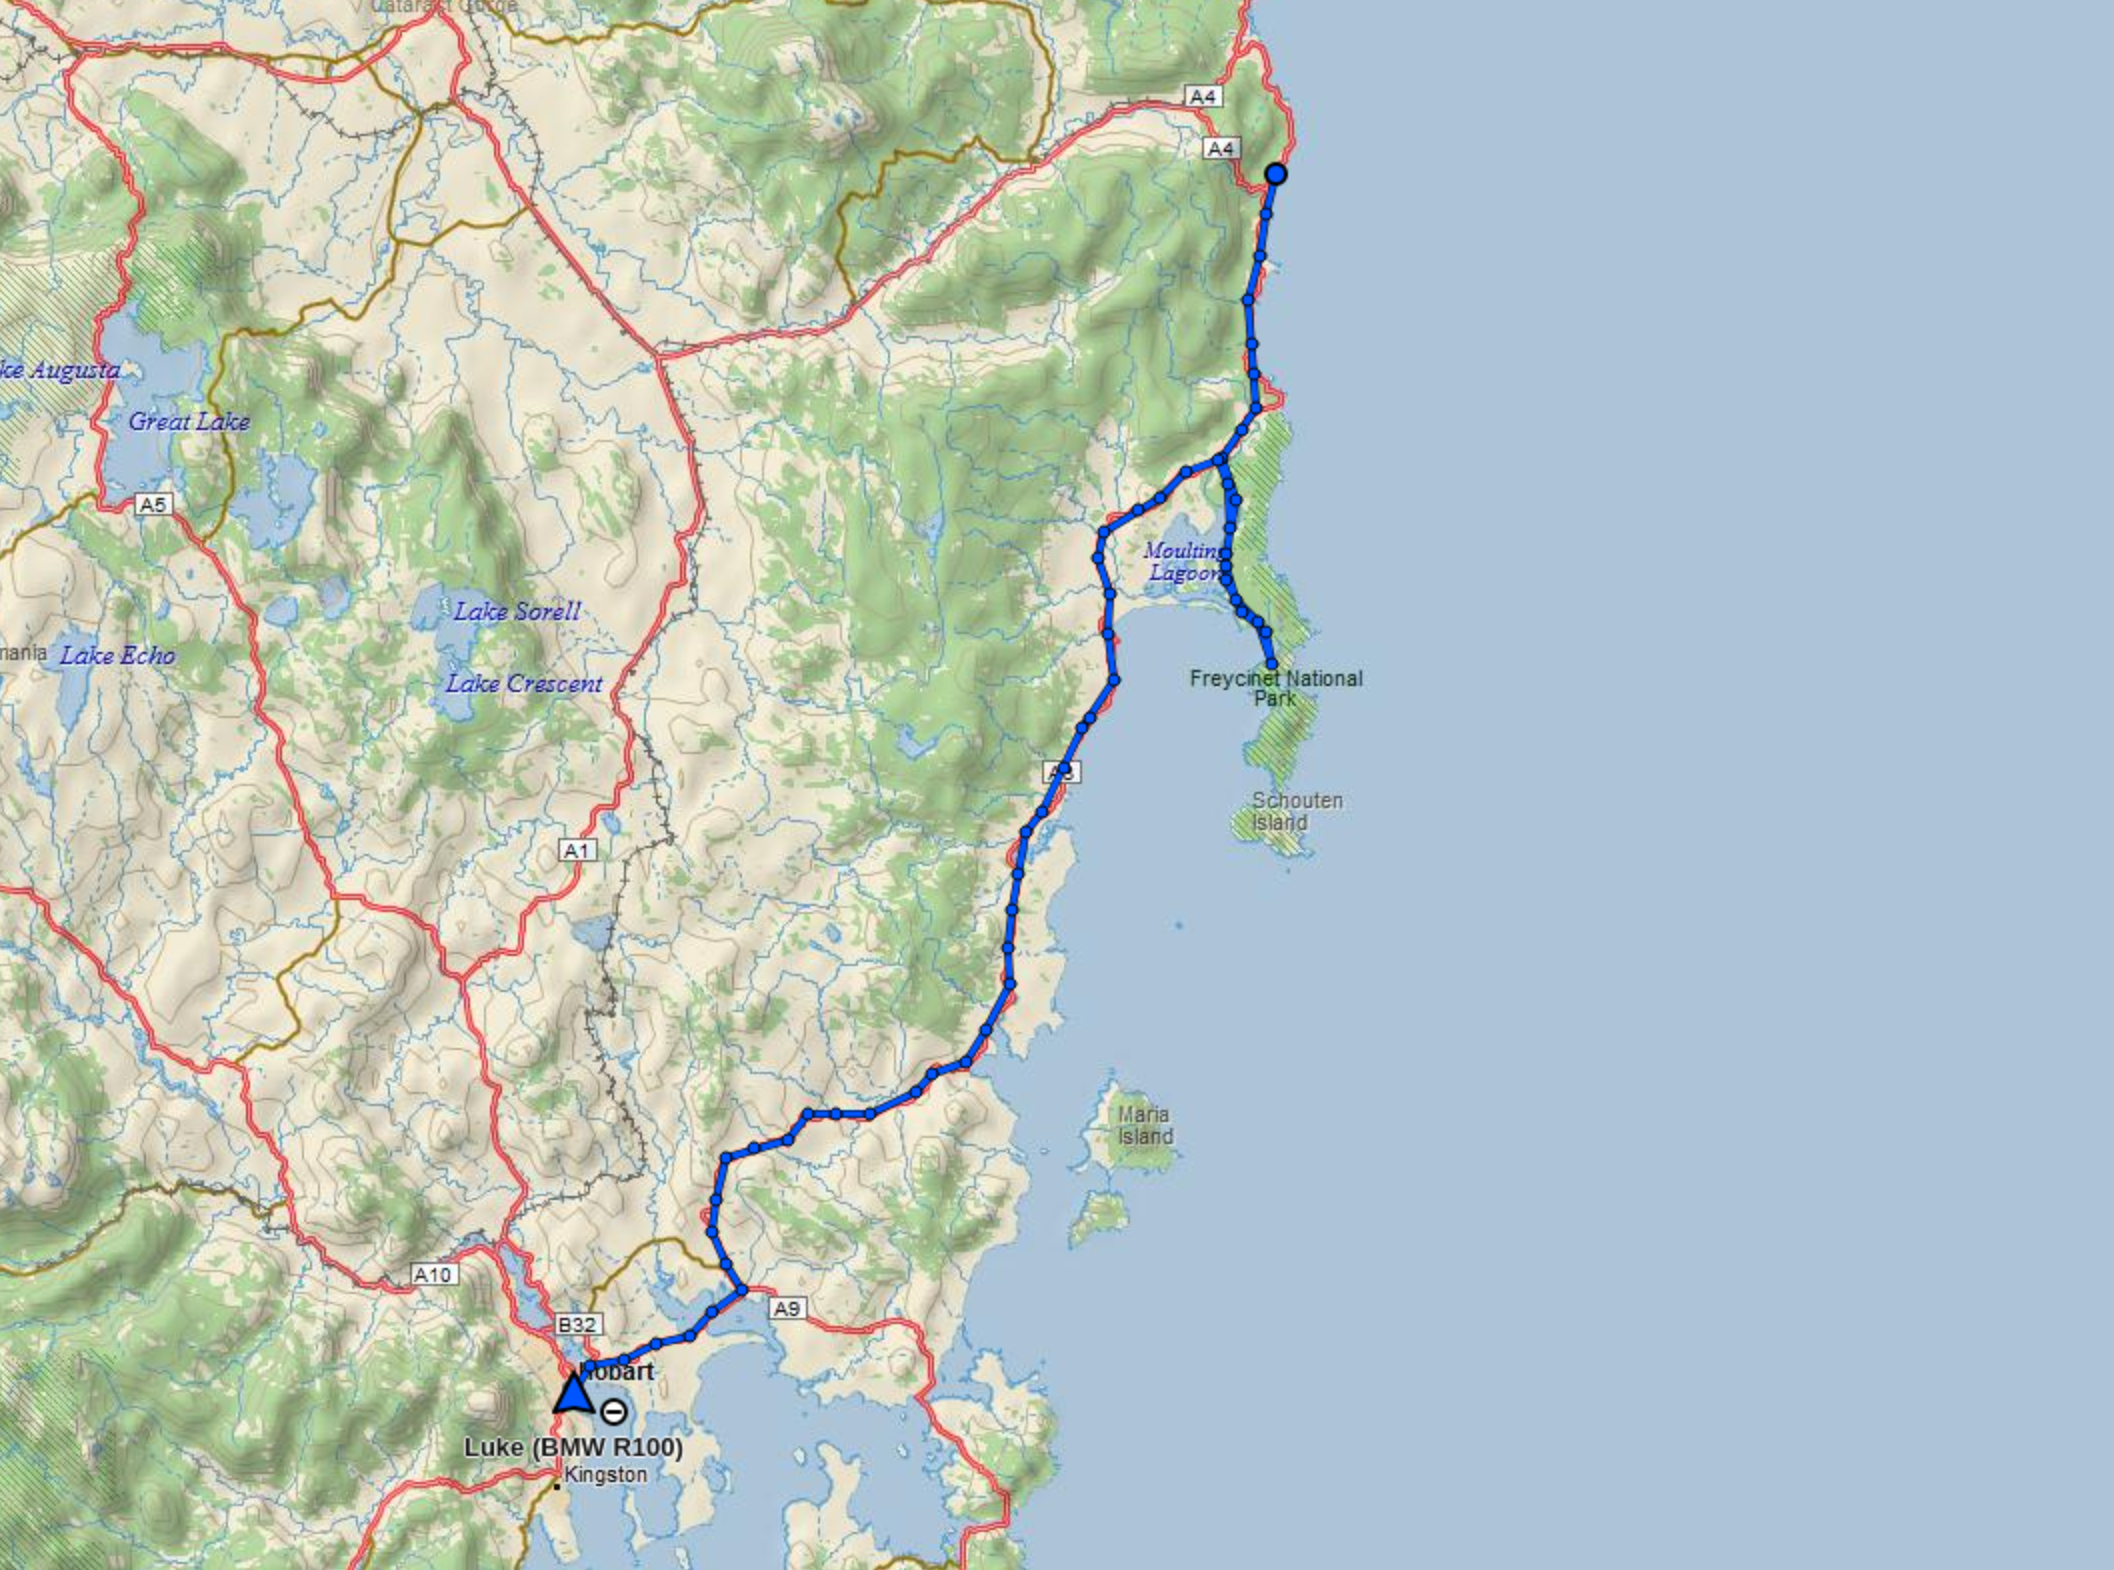 Perth Trip – Day 10 – 2019/12/11